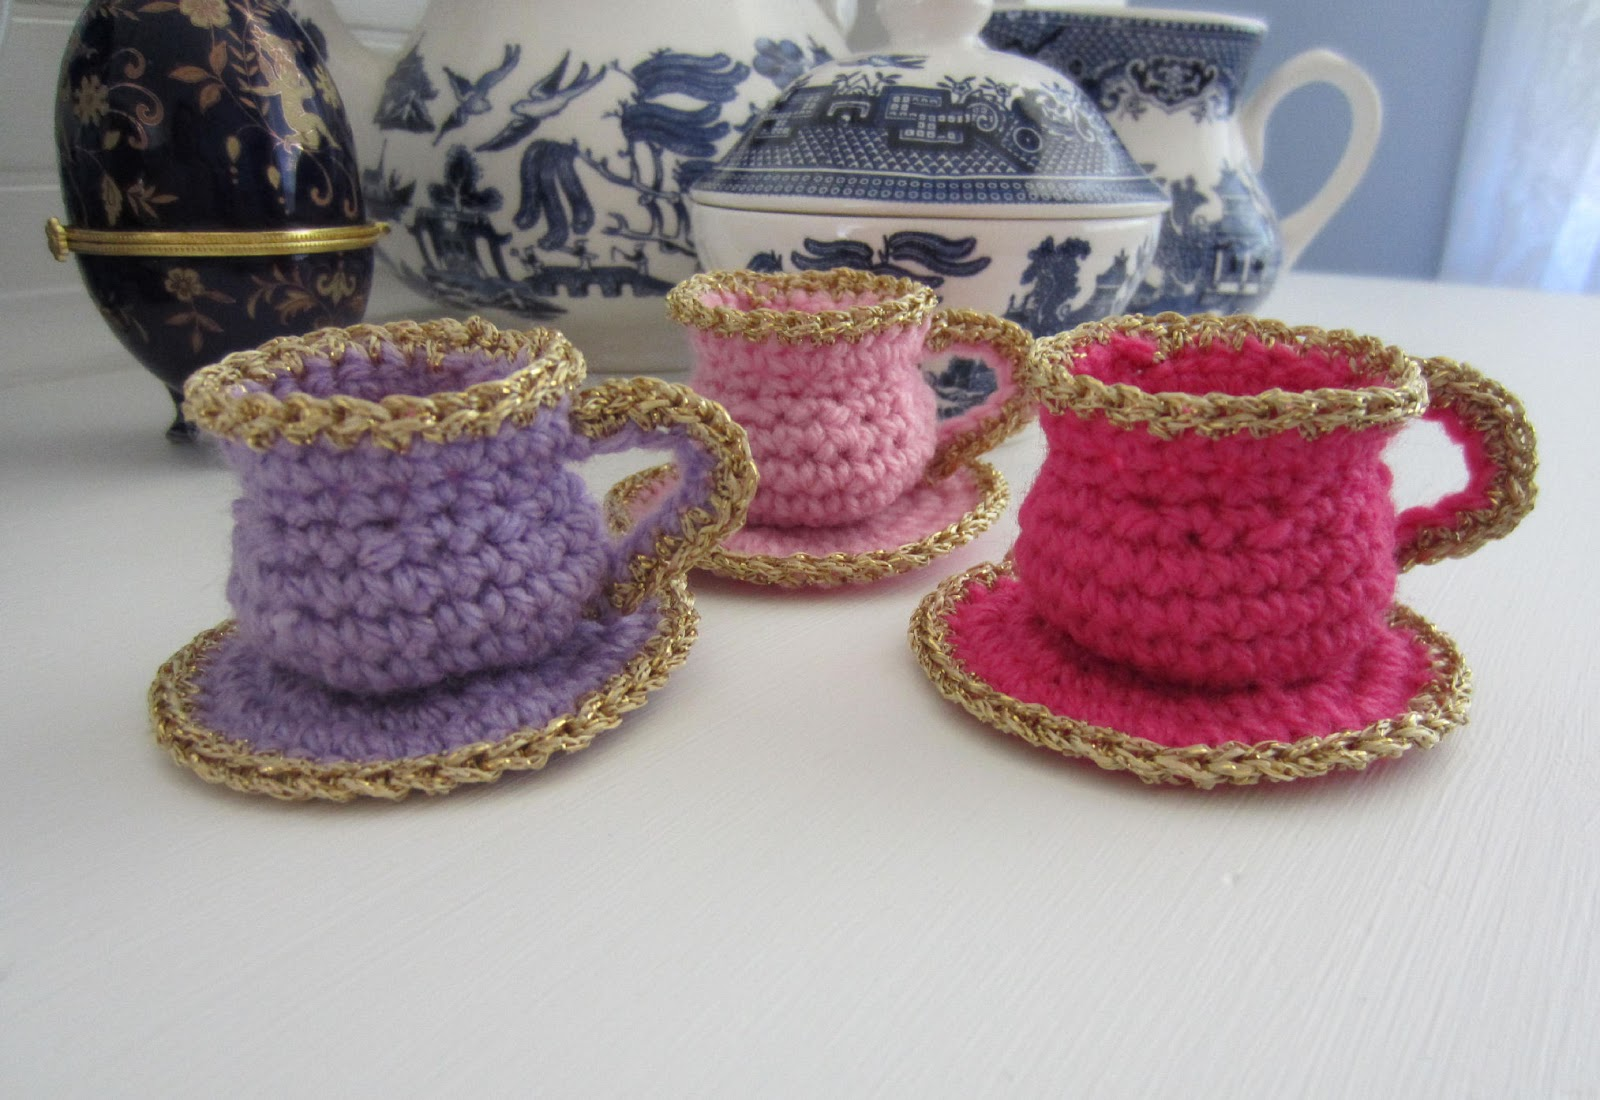 Justjen-knits&stitches: Tea Cup Christmas Ornament Pattern - Crochet